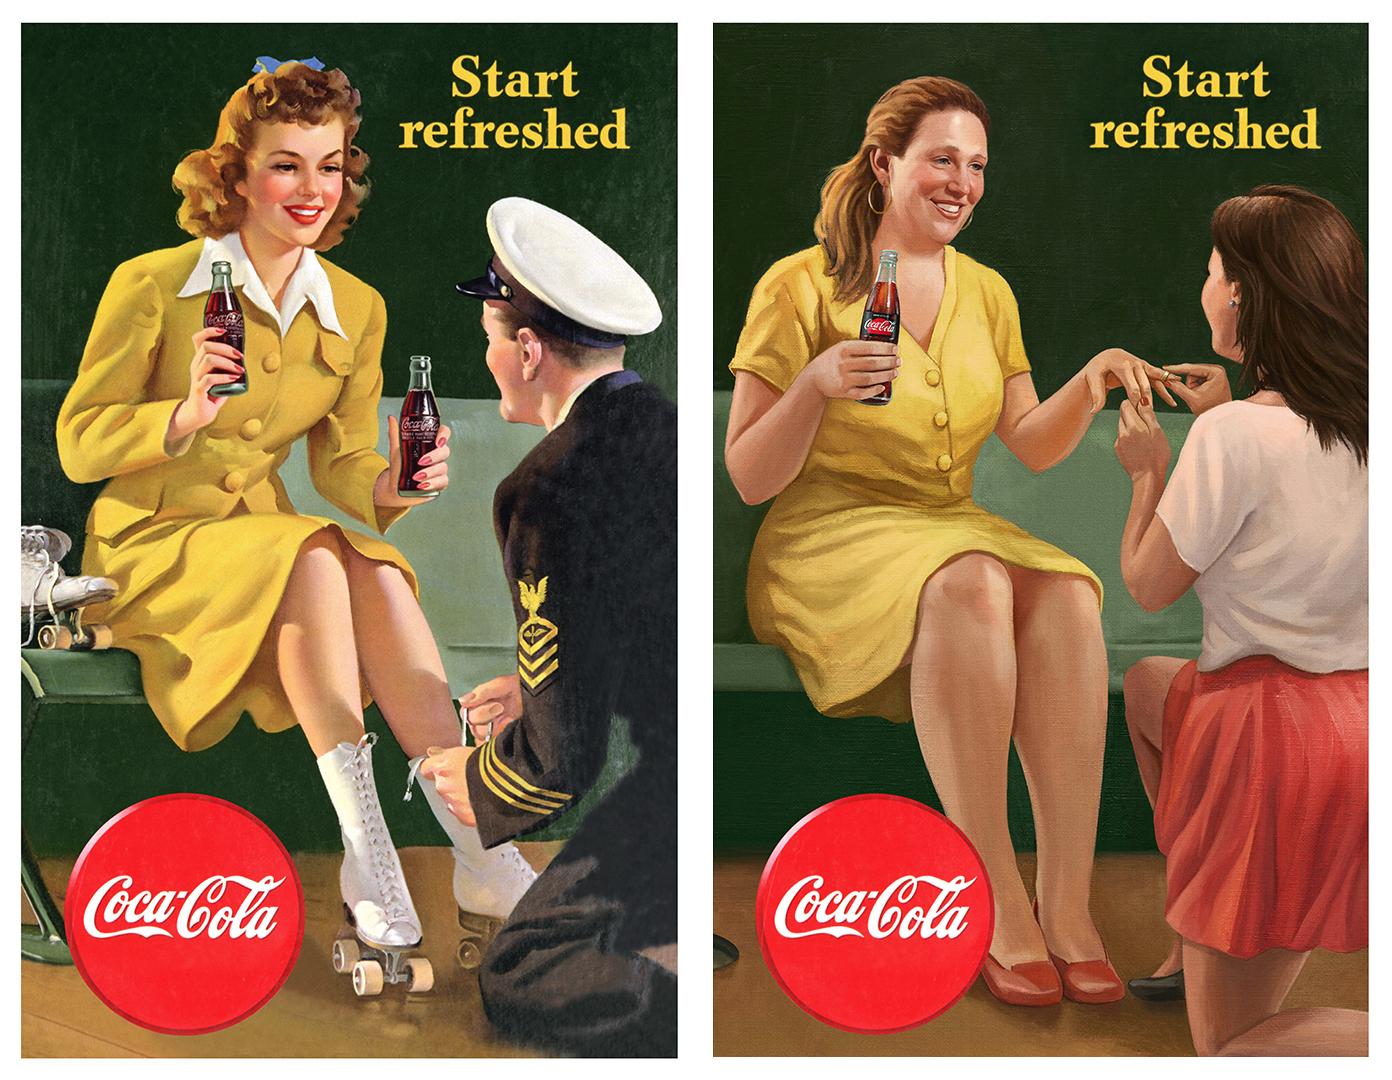 Posters Coca-Cola - Pedido.jpg